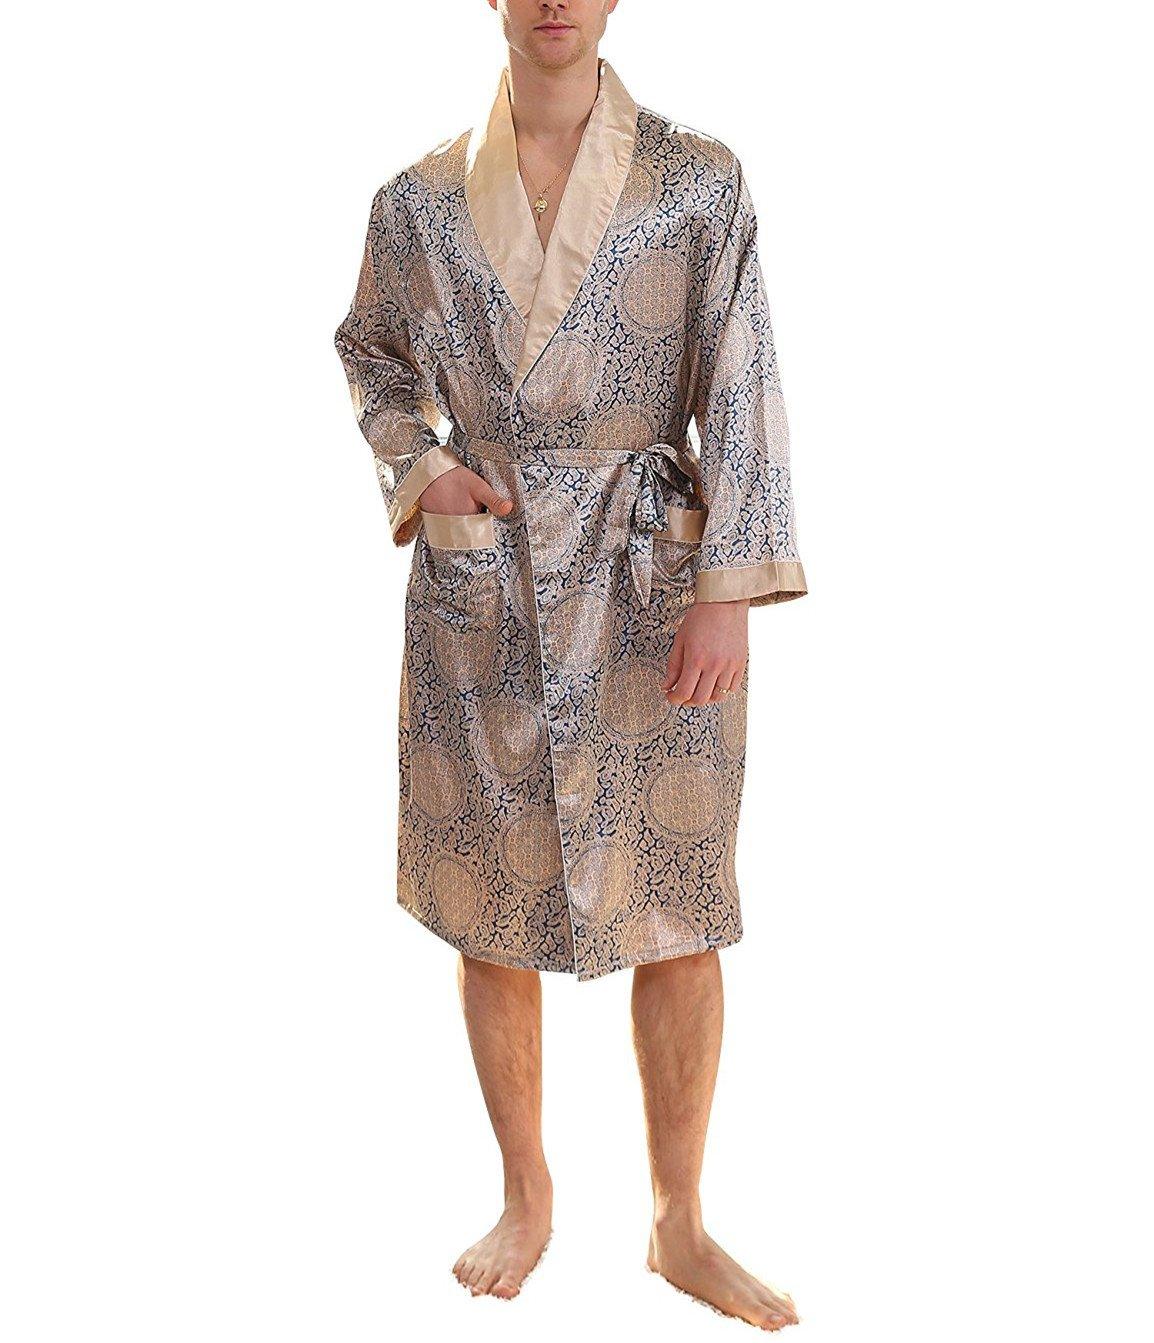 YIMANIE Men's Silk Satin Robe Luxurious Spa Long Sleeve House Kimono Nightwear Bathrobe,Blue Gold,2XL